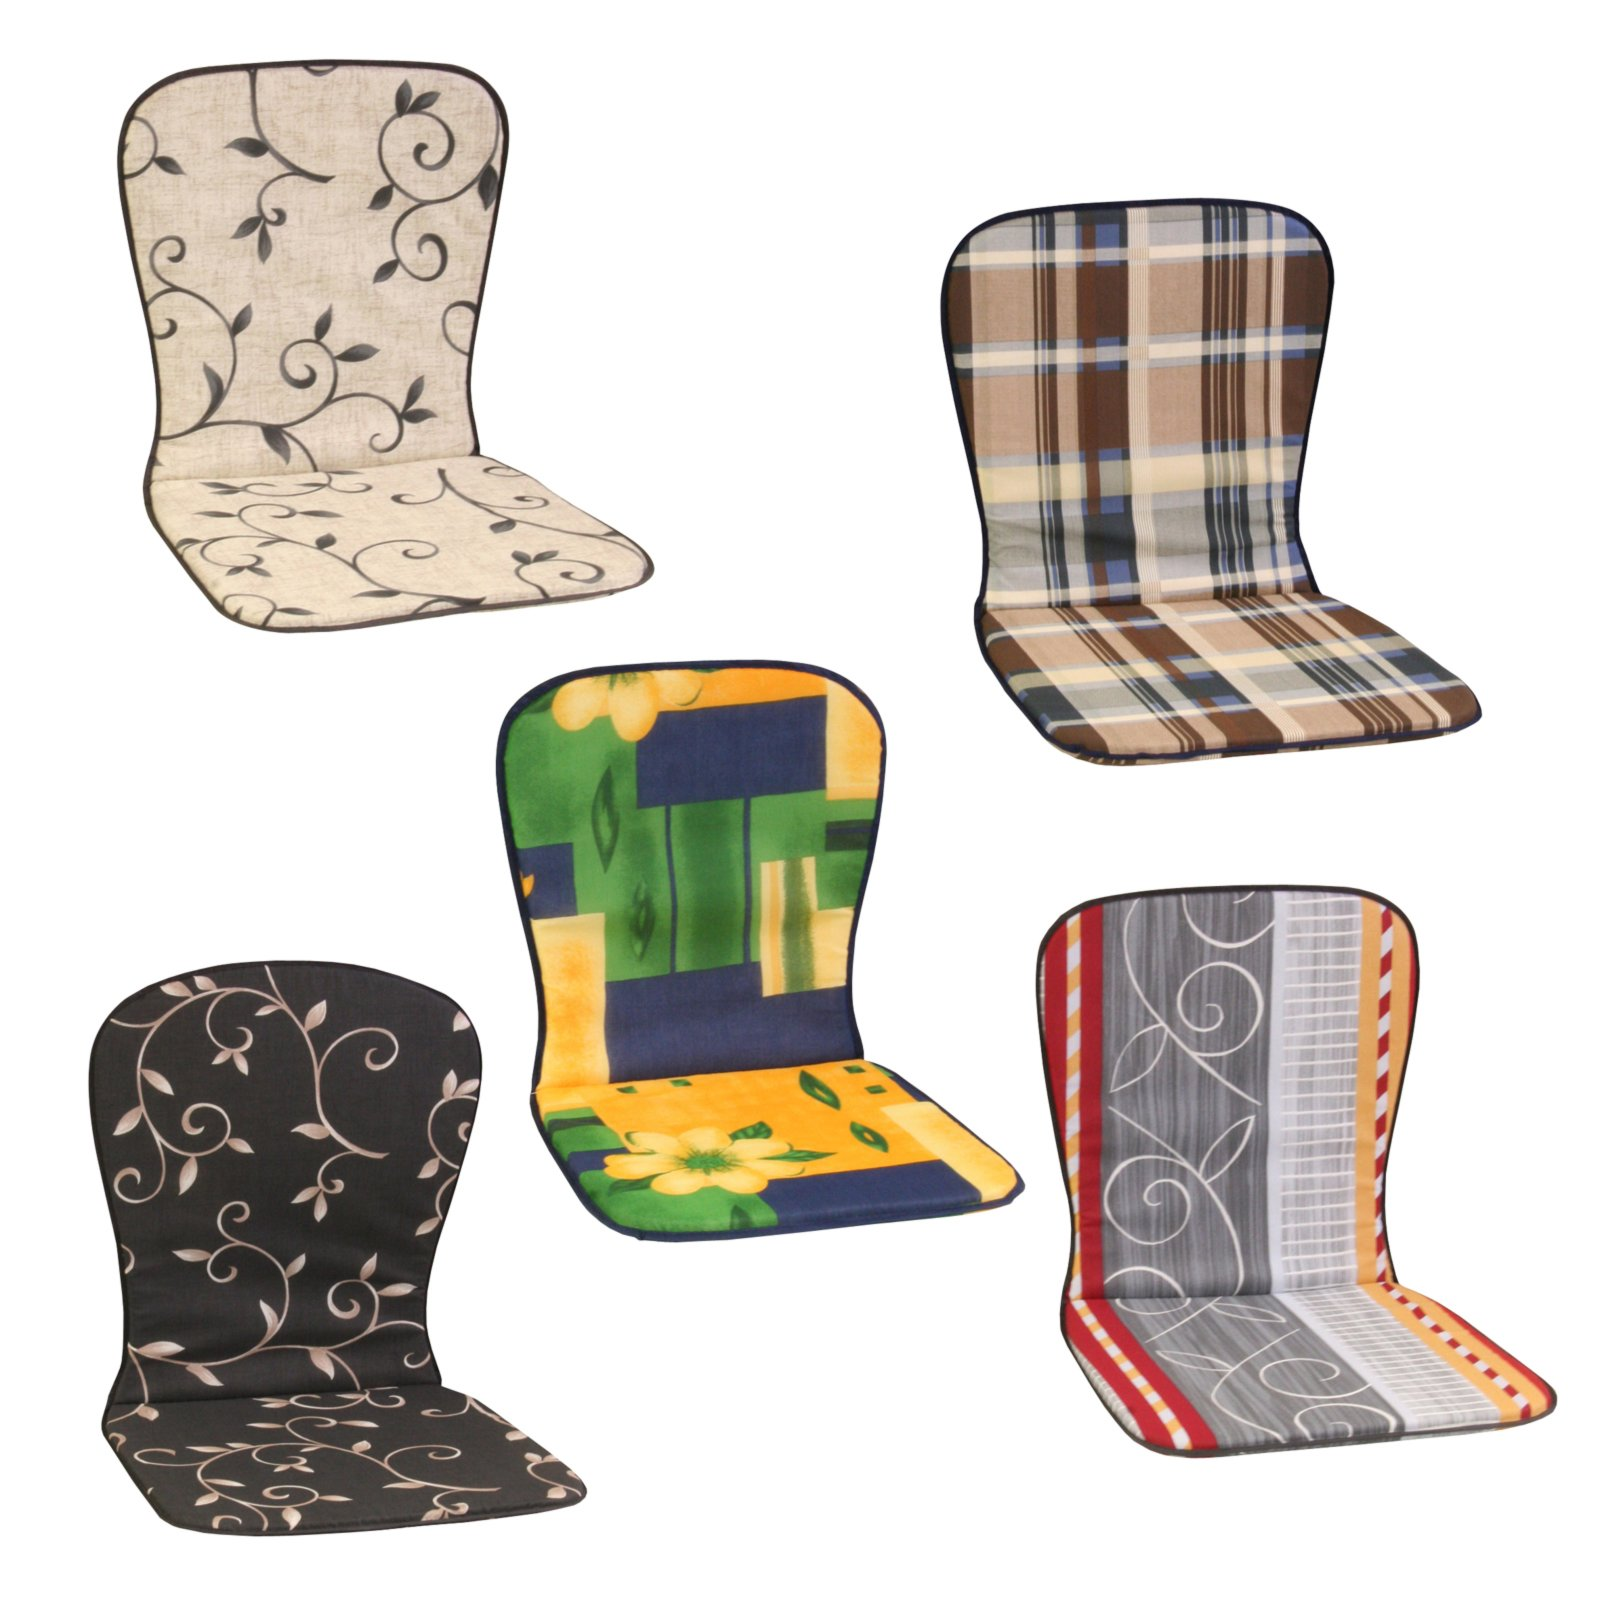 gartenmbel roller wildau top wildau vacation rentals. Black Bedroom Furniture Sets. Home Design Ideas